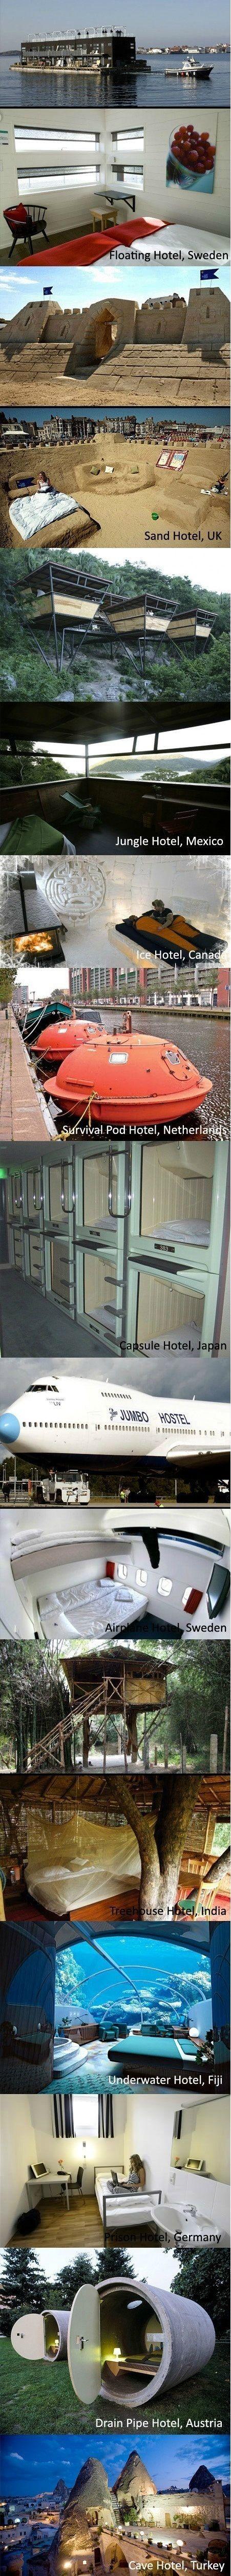 Strange and unique hotels around the world